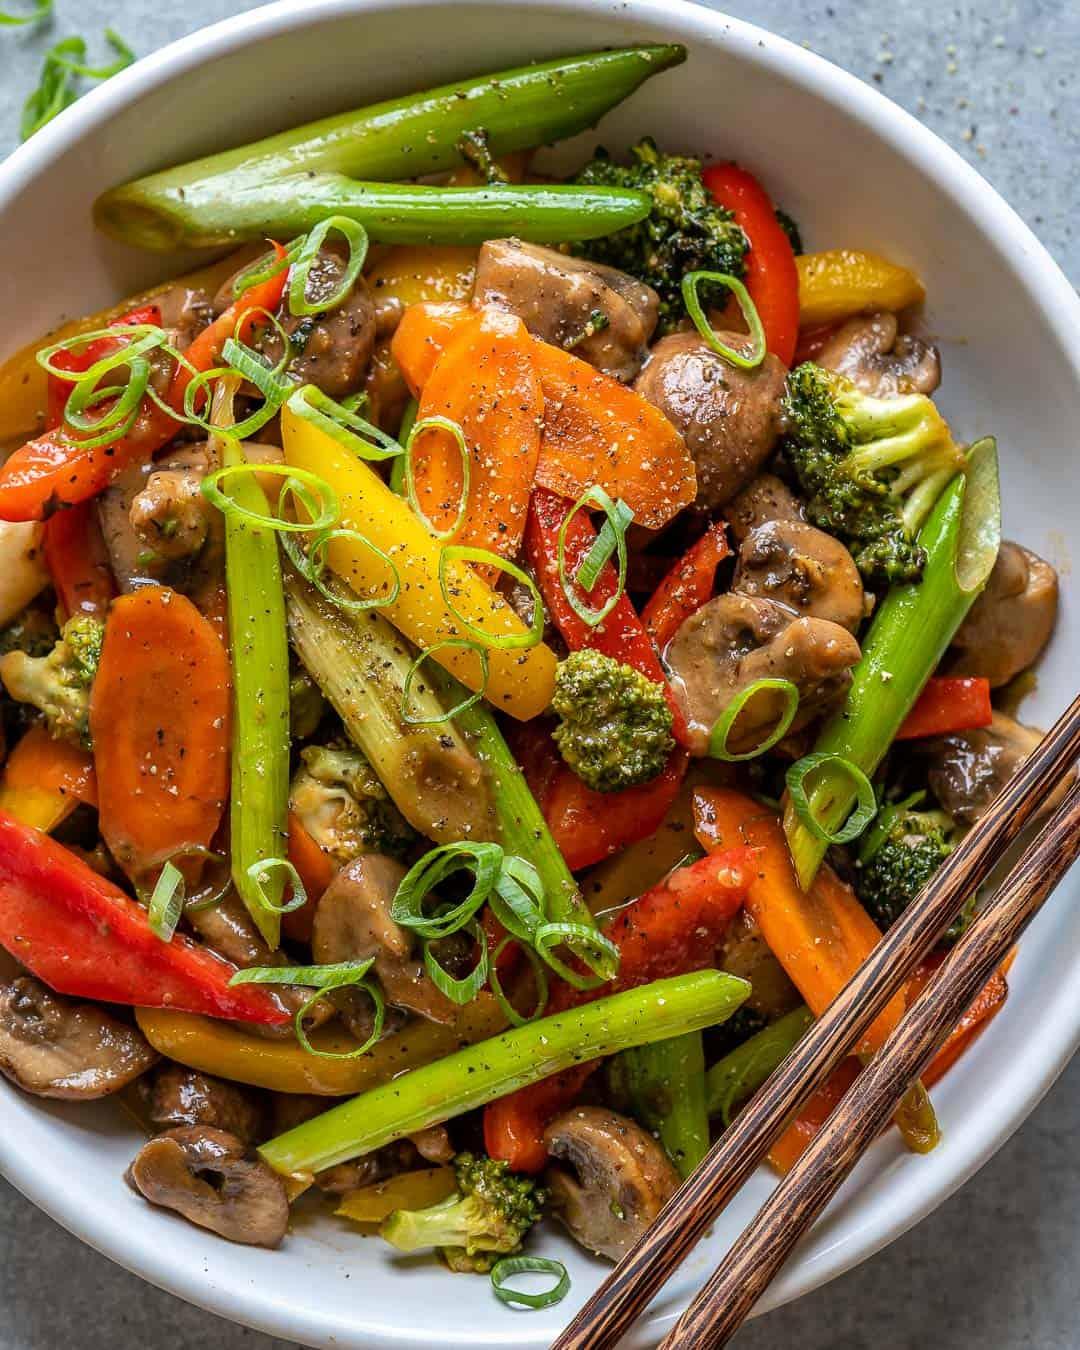 White bowl of vegetable stir fry with chopsticks.